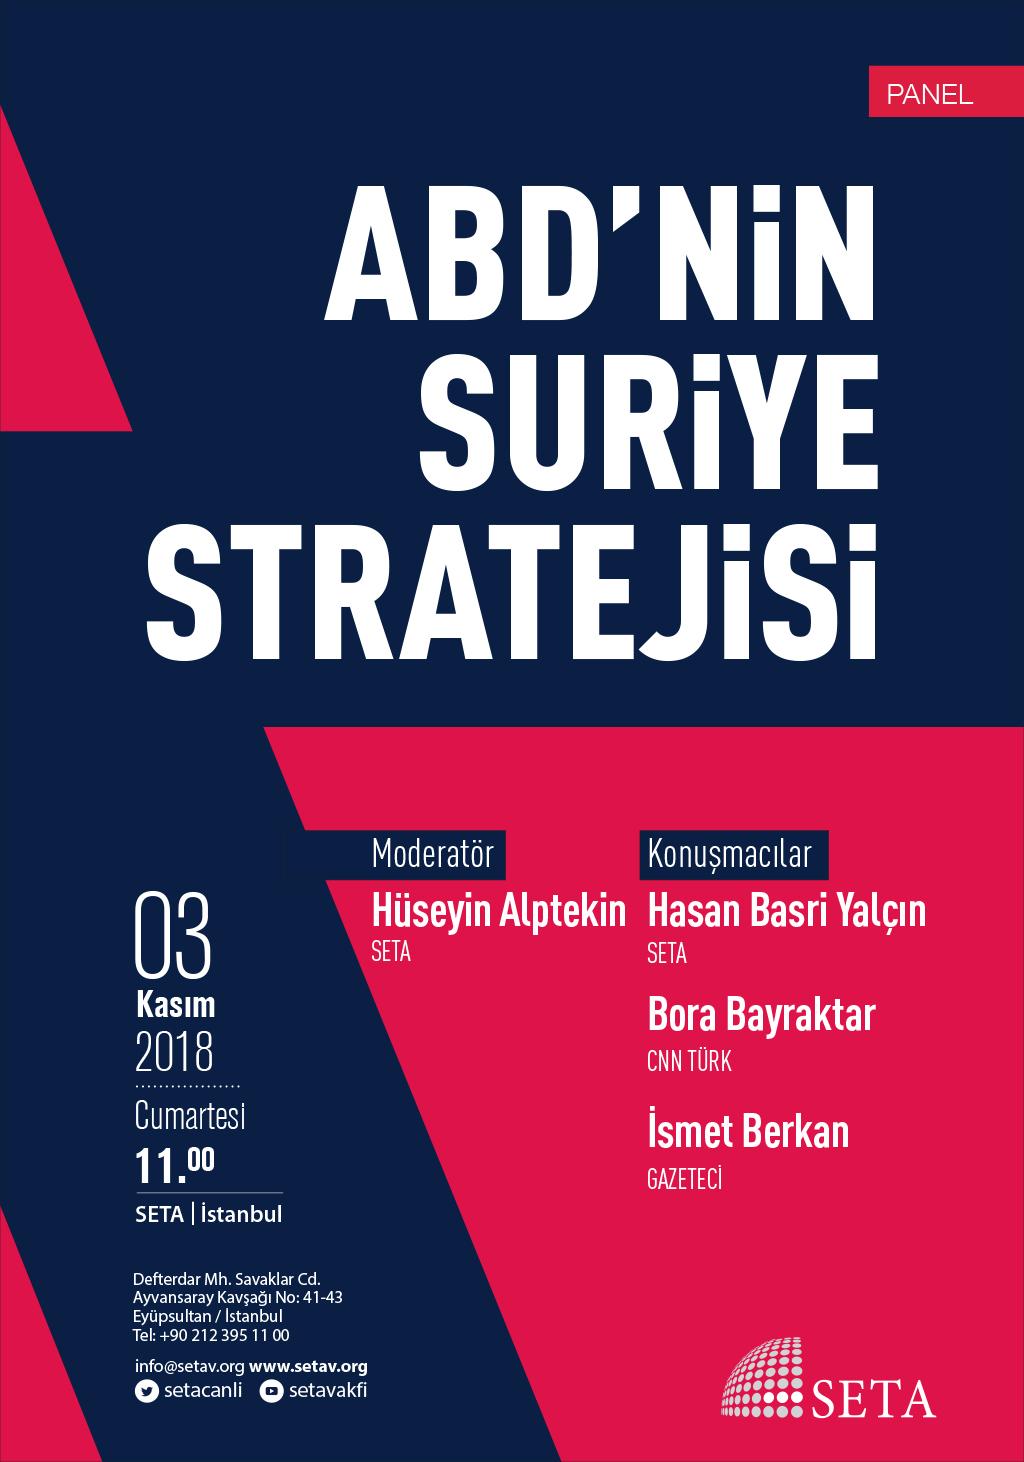 Panel: ABD'nin Suriye Stratejisi